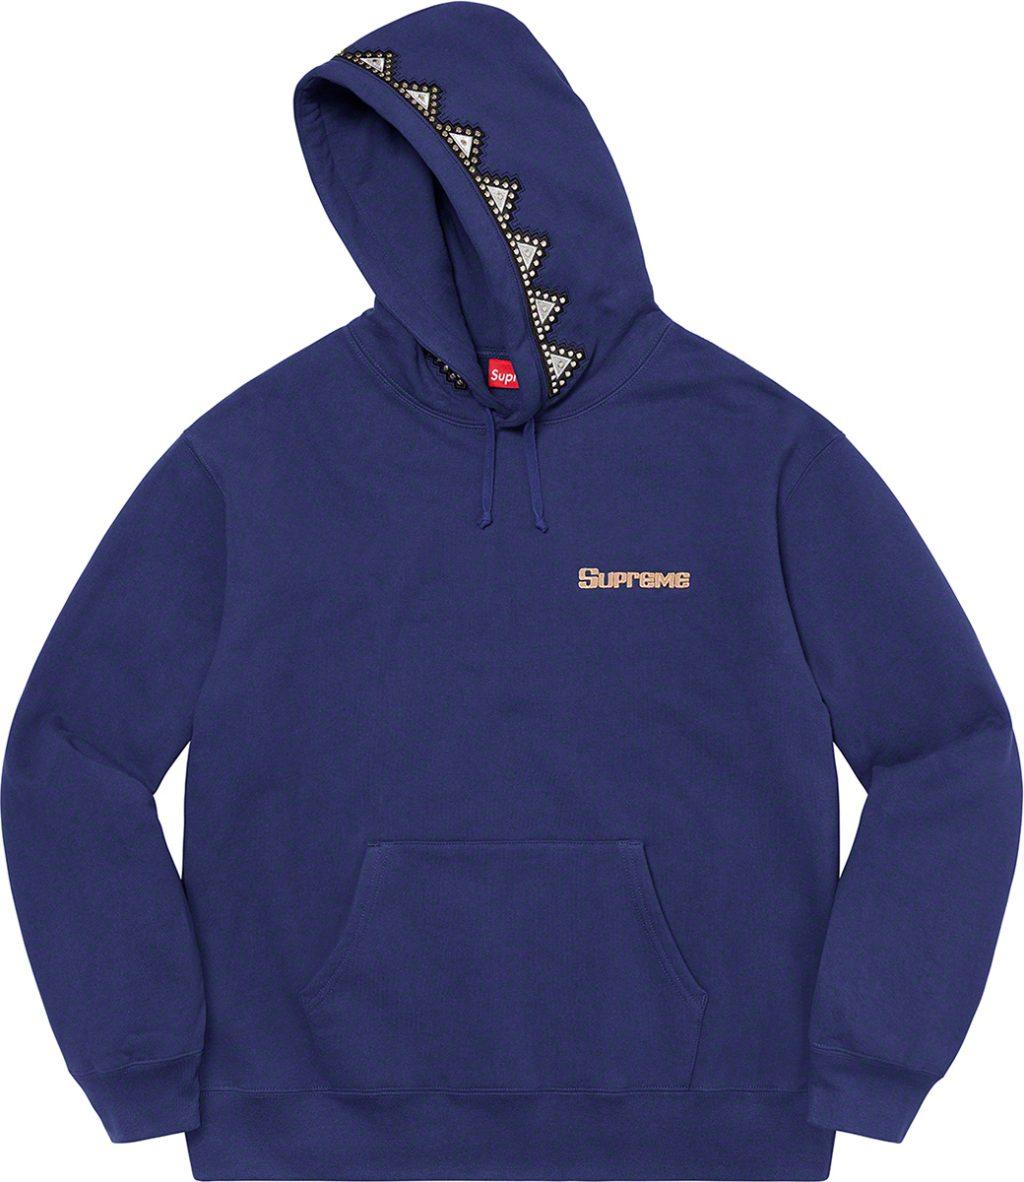 supreme-20aw-20fw-pharaoh-studded-hooded-sweatshirt